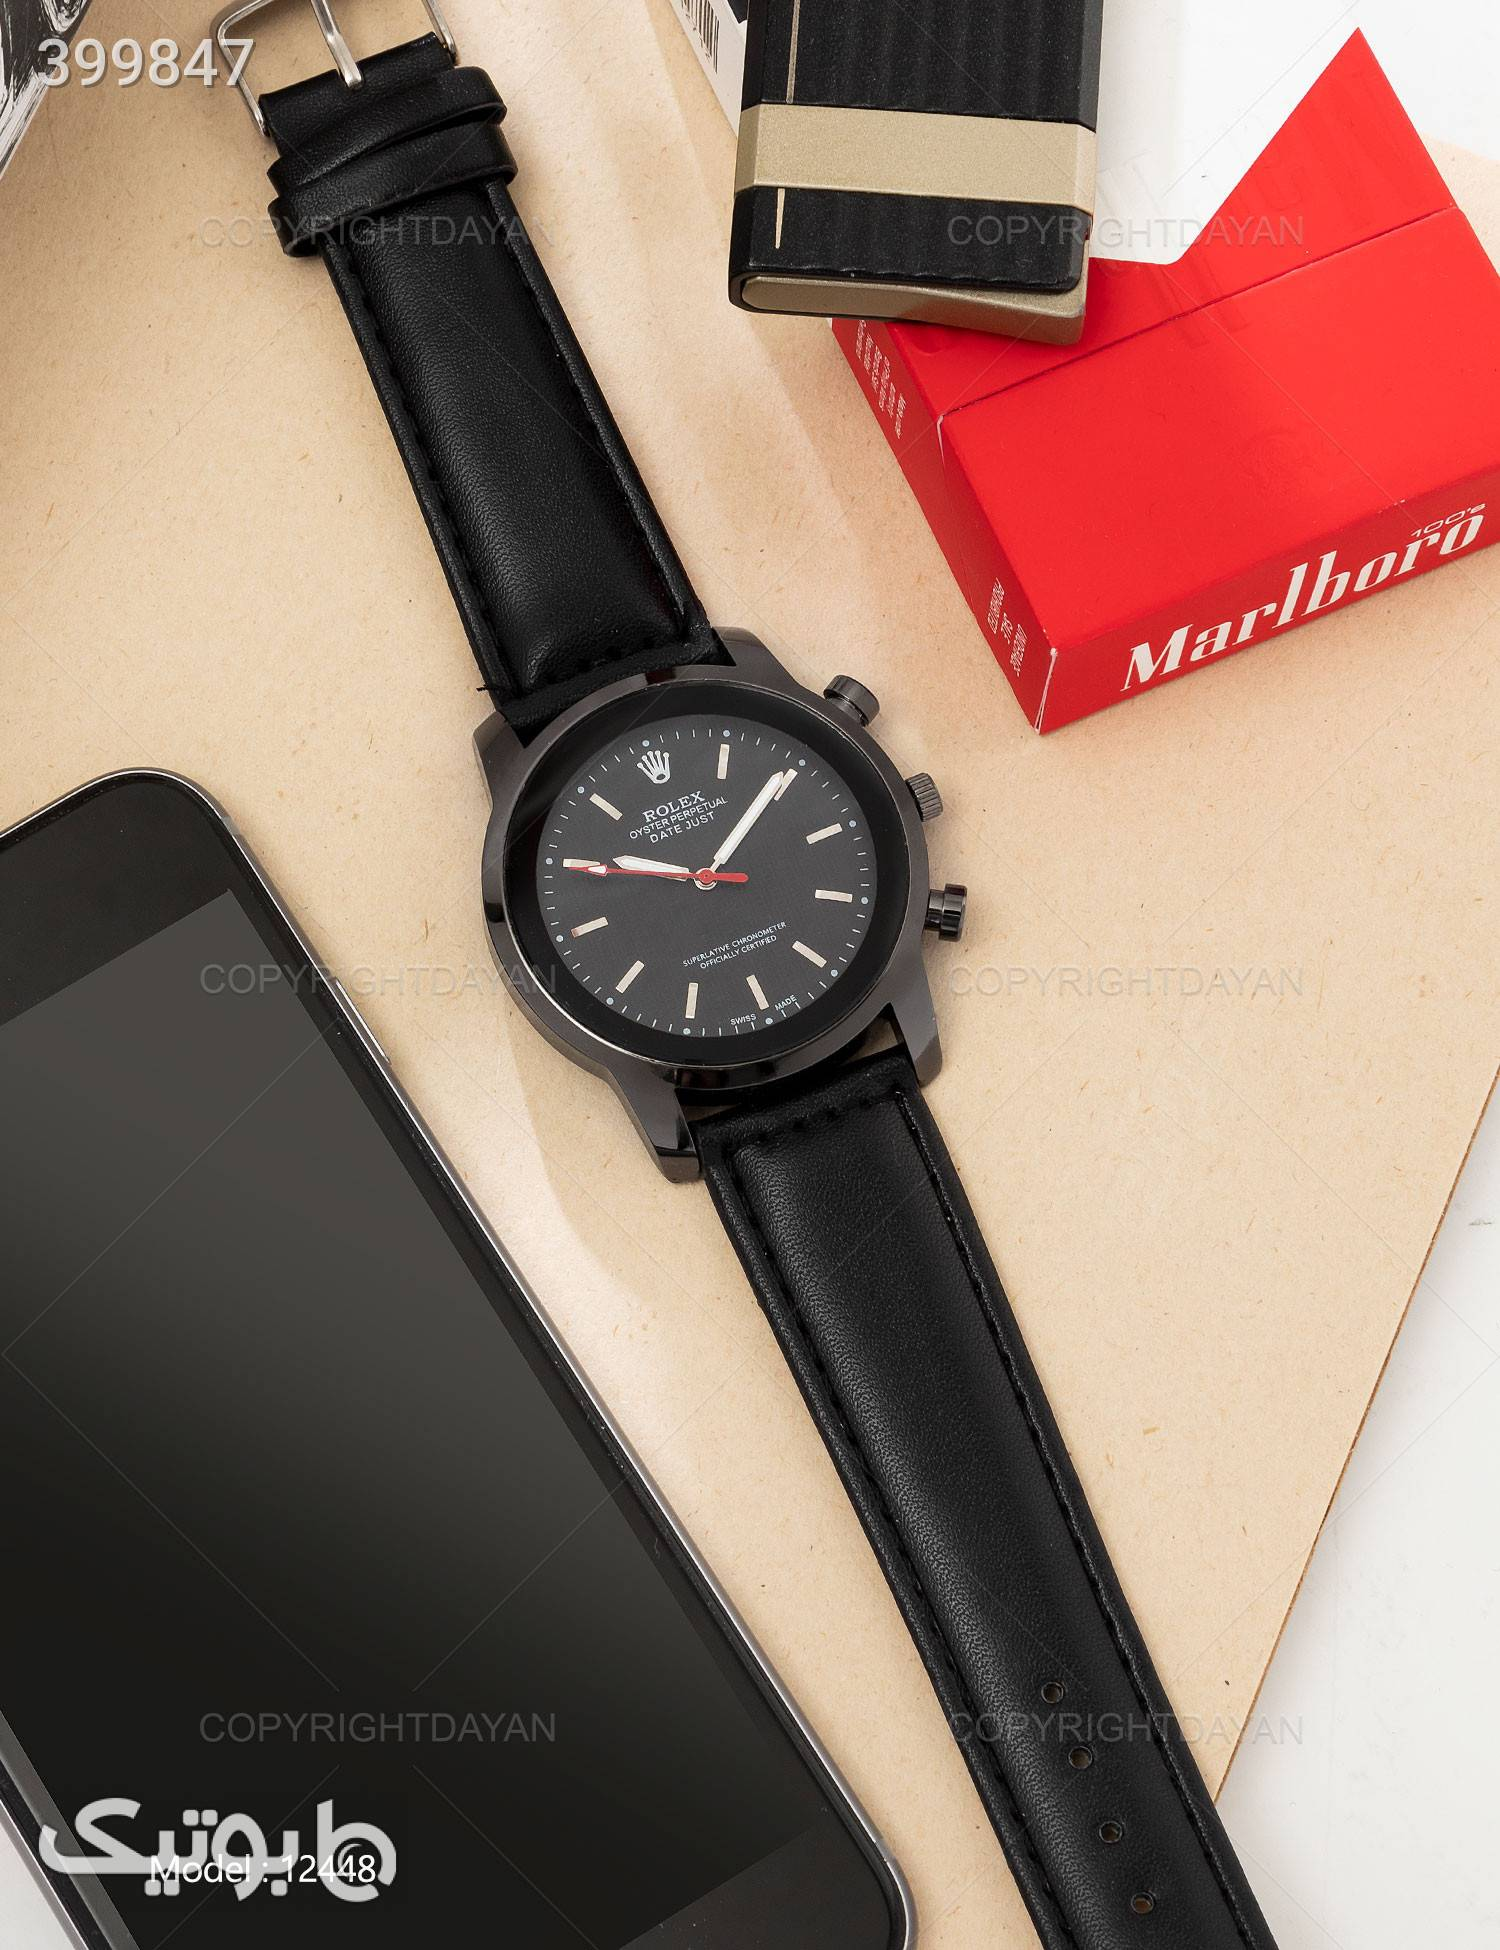 ساعت مچی مردانه Rolex مدل W2448 مشکی ساعت